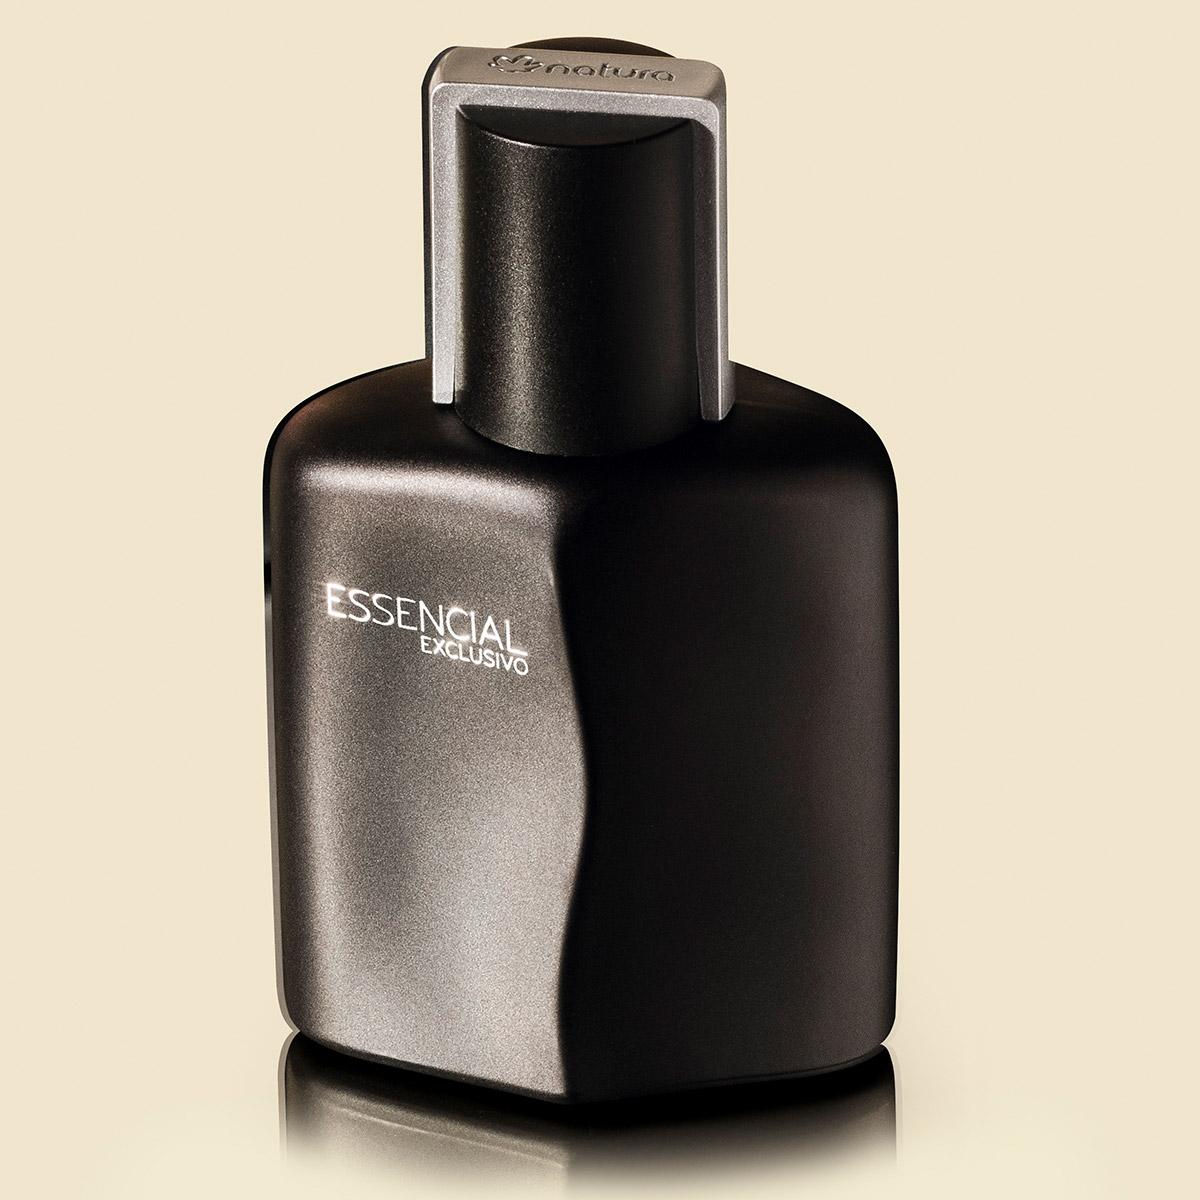 Deo Parfum Essencial Exclusivo Masculino - 50ml - 68240